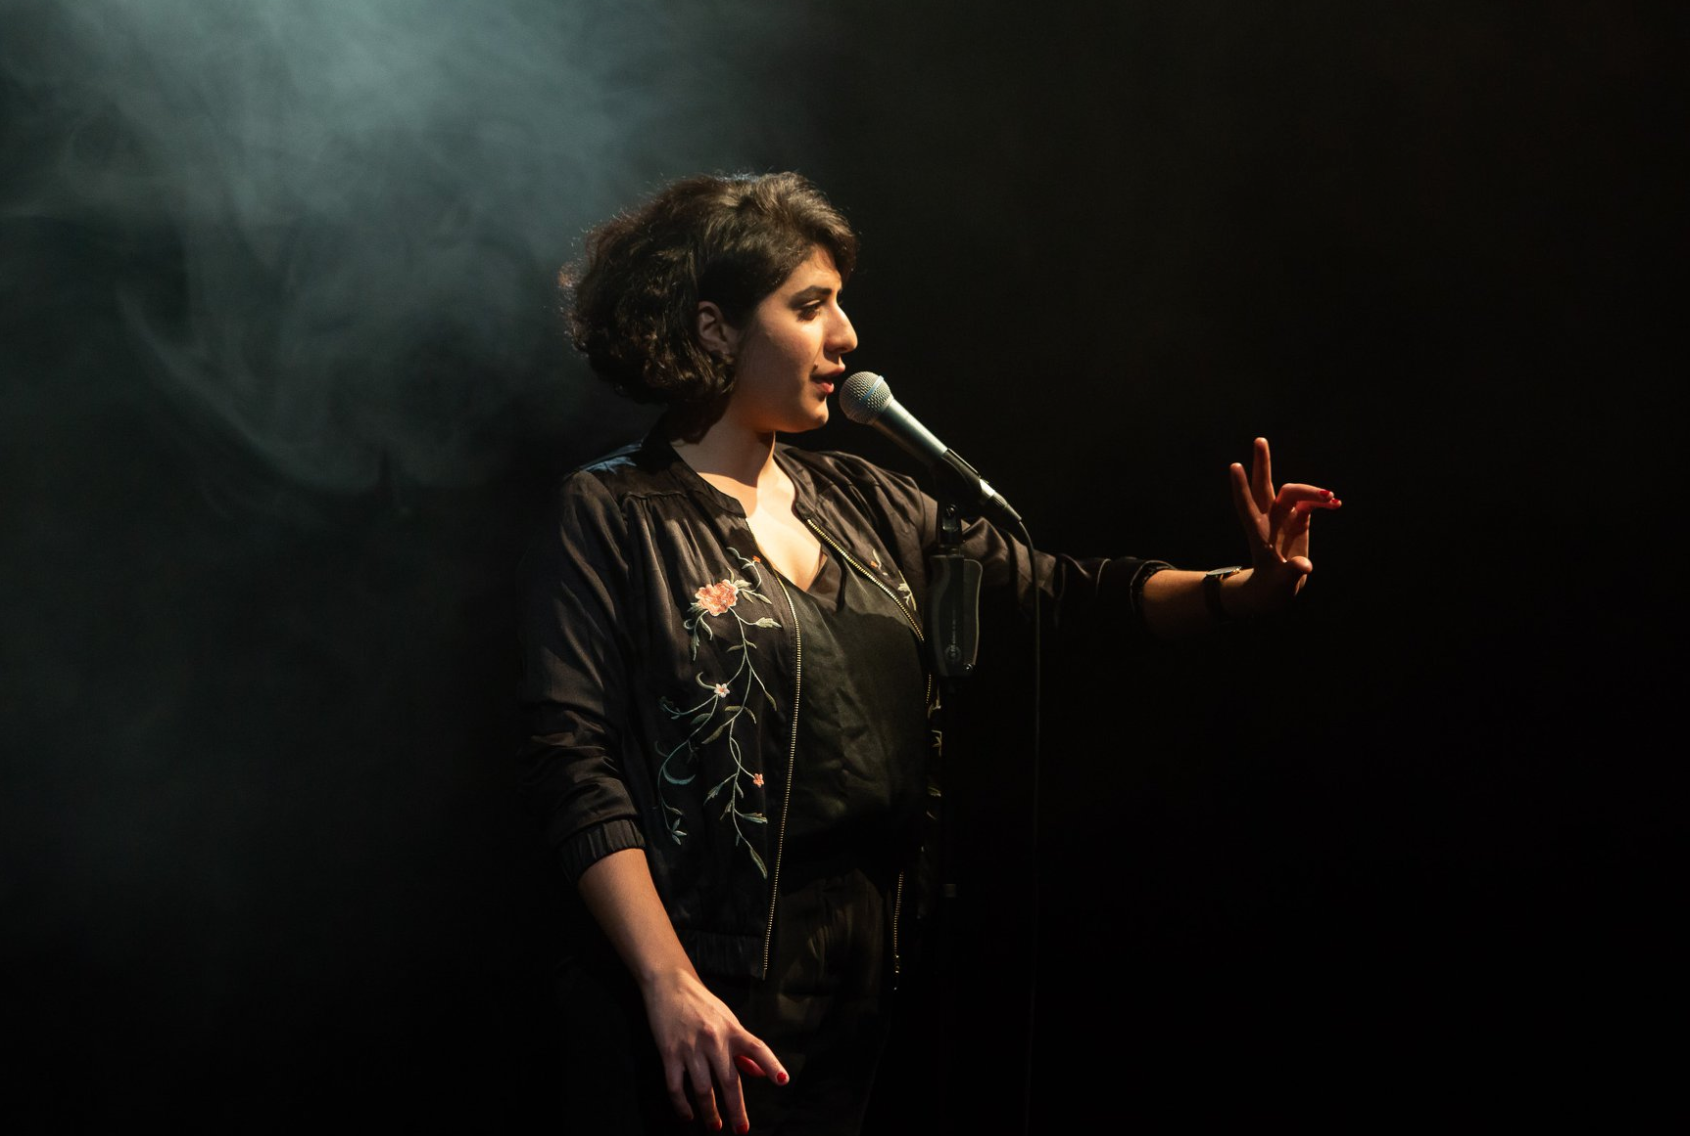 Best of Poetry Slam versüßt dir bei Draußen im Grünen den Abend.